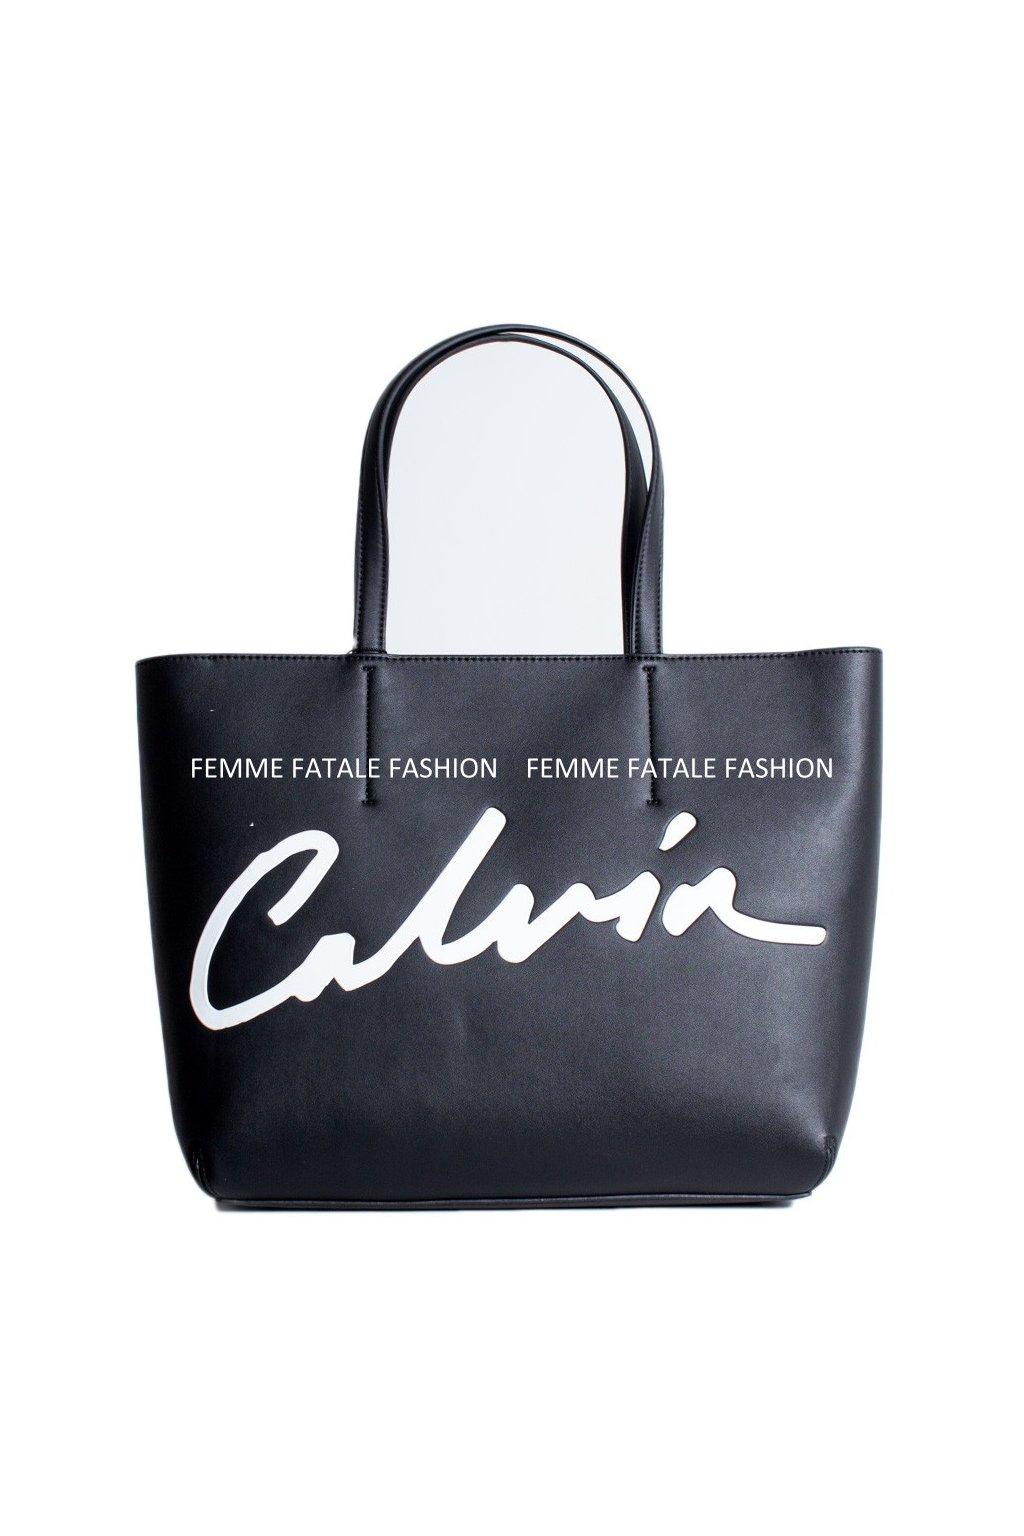 Dámská kabelka Calvin Klein Jeans CKJ Sculpted Shopper Black